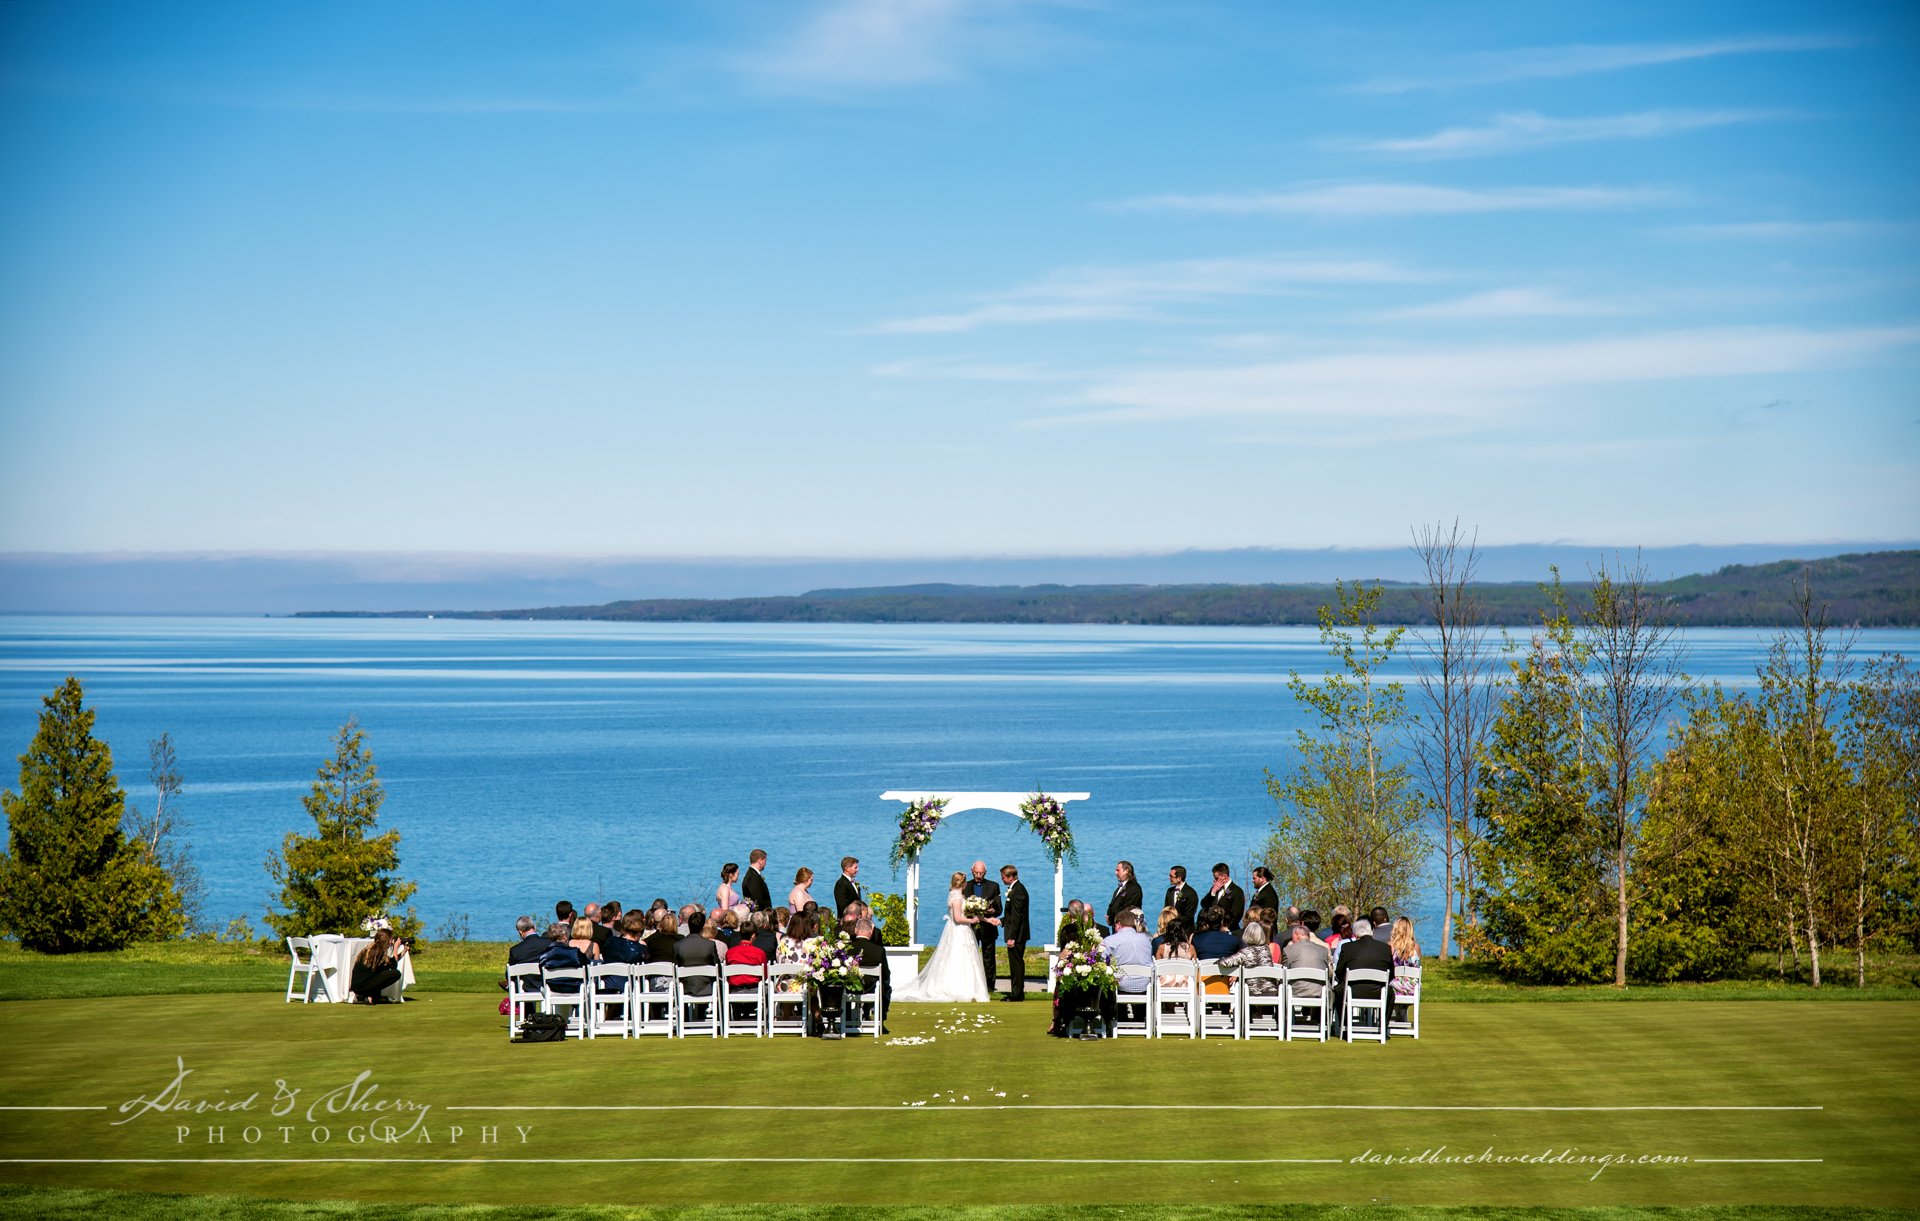 Cobble_Beach_Wedding_Photography_12